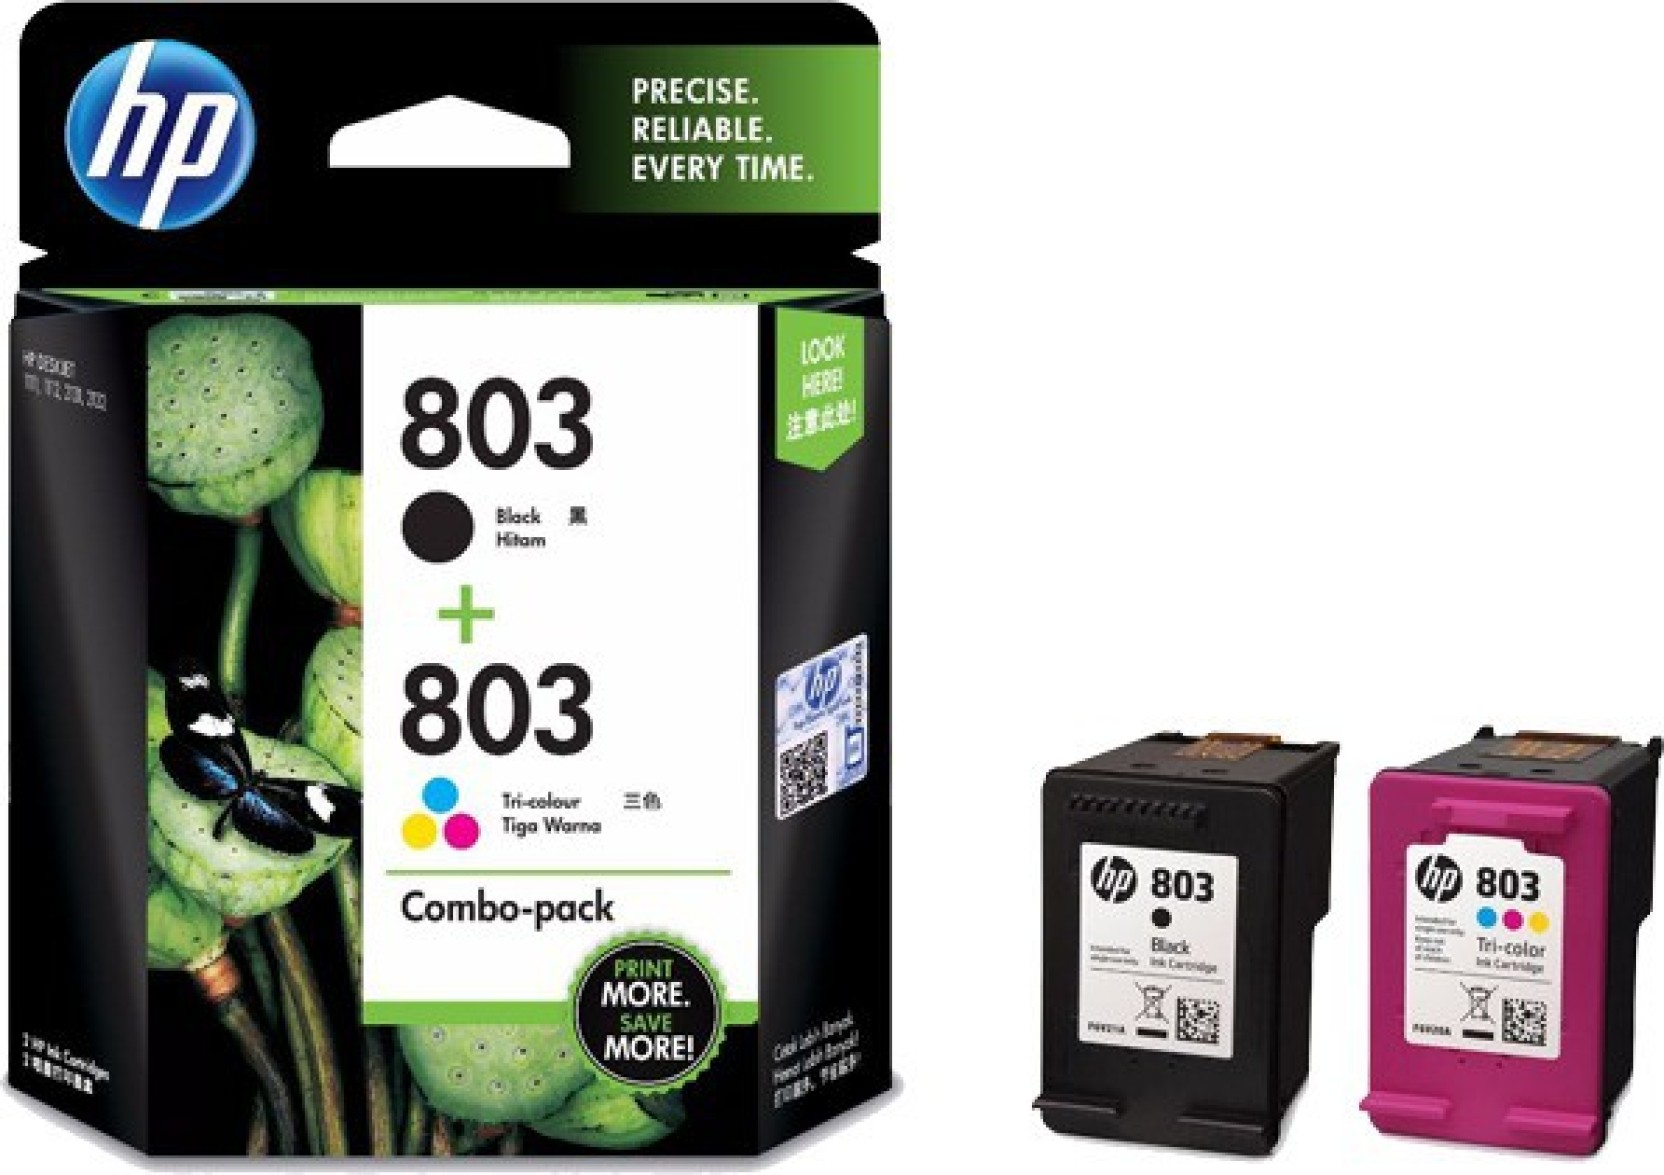 2 Pack Genuine HP 61XL Black Ink Cartridges No Box